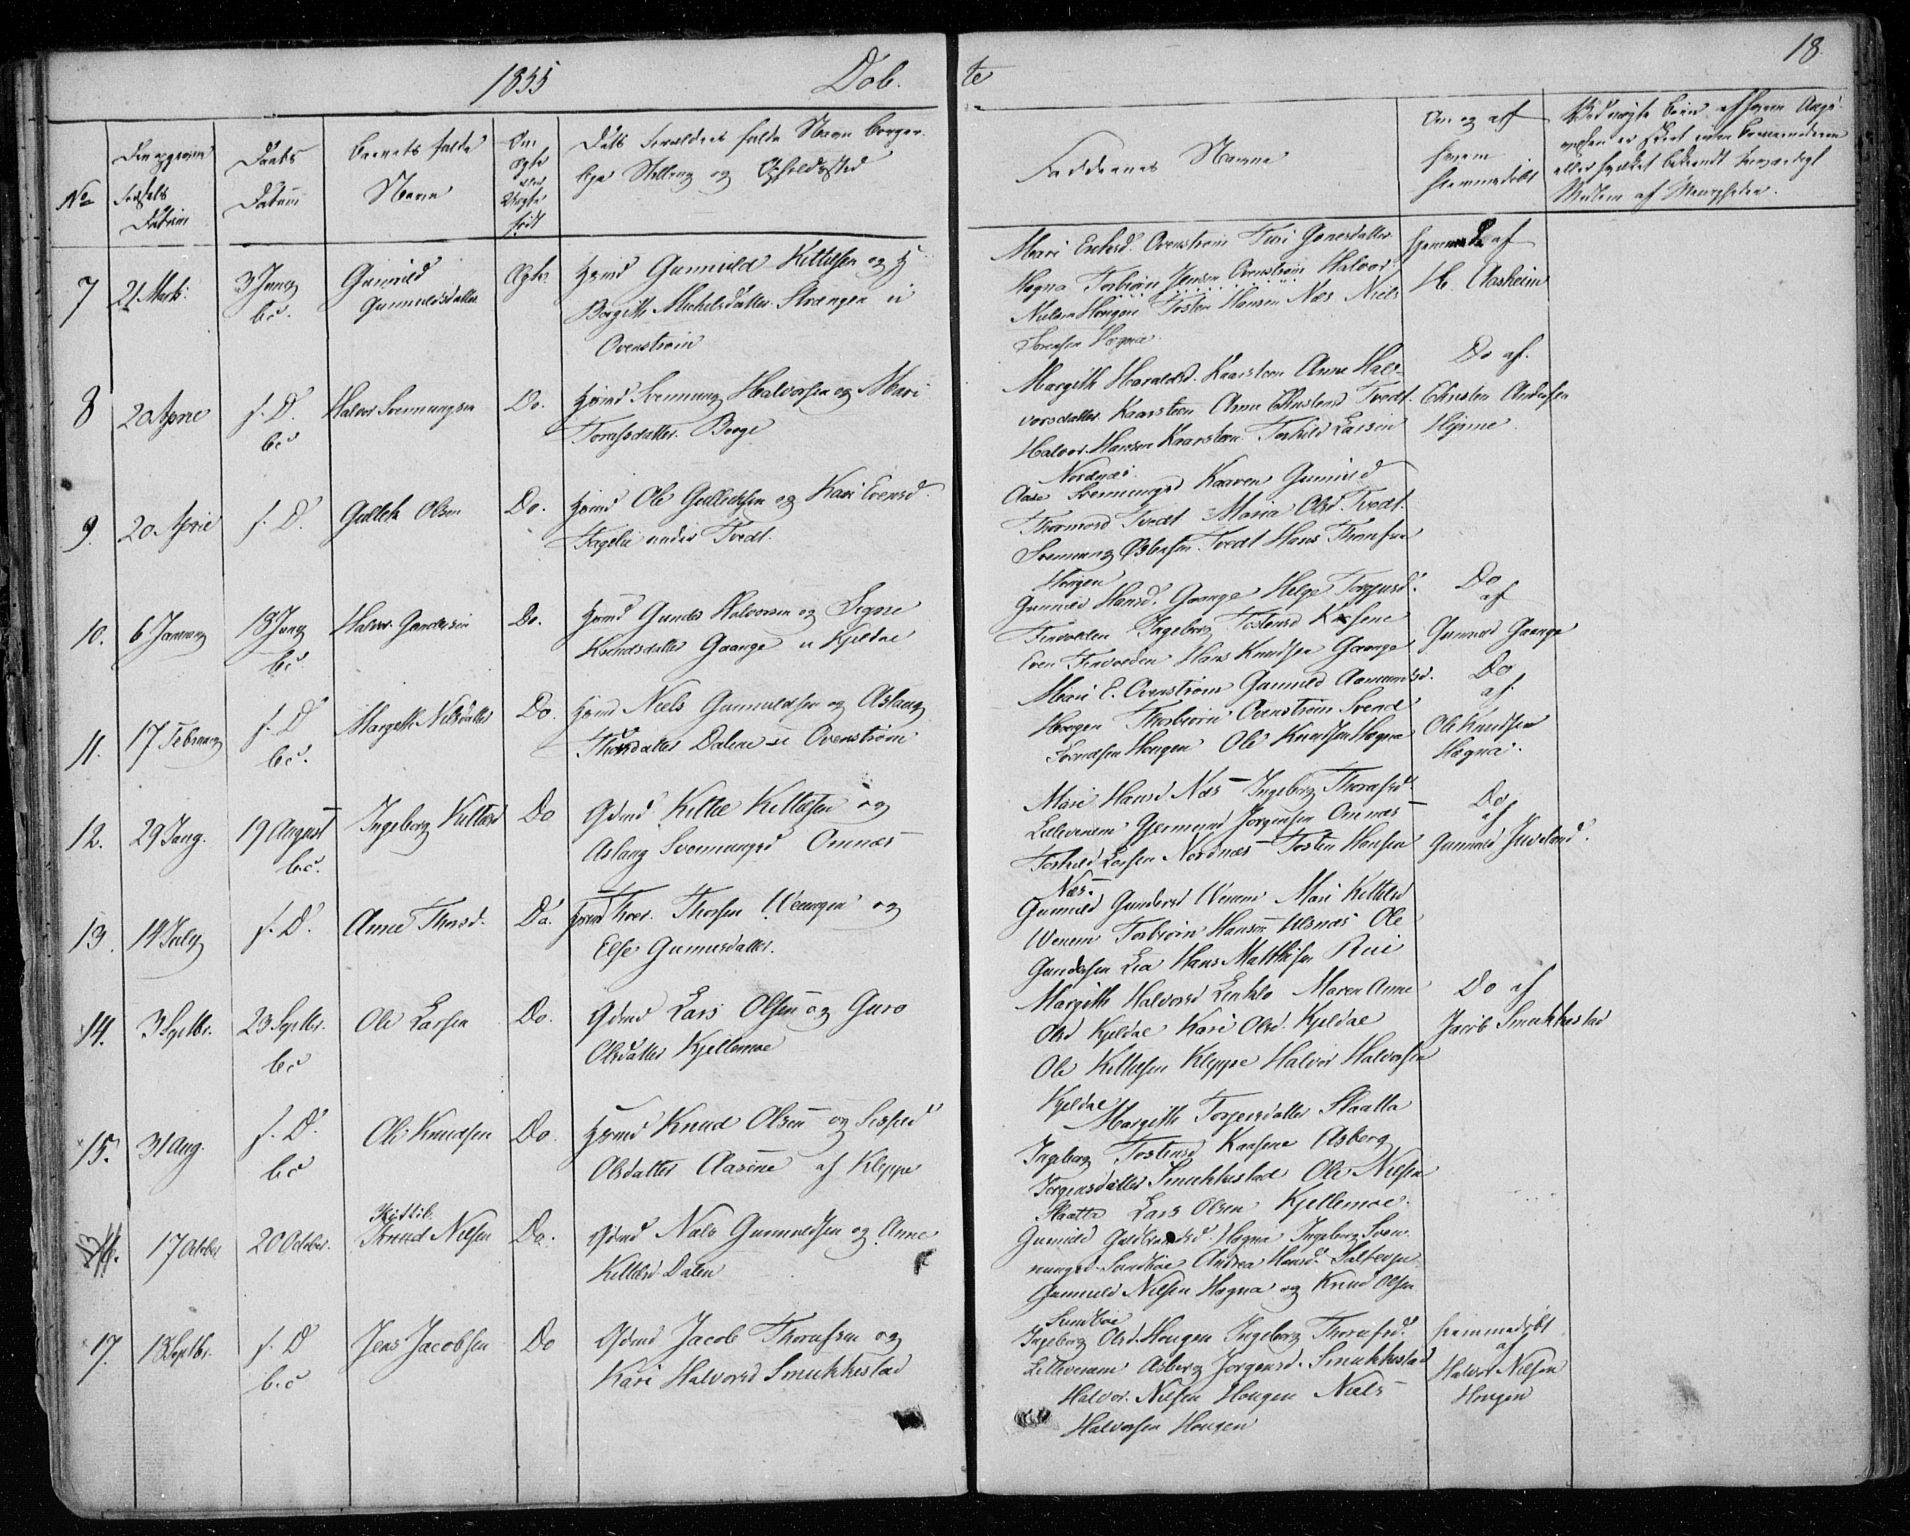 SAKO, Lunde kirkebøker, F/Fb/L0001: Ministerialbok nr. II 1, 1845-1861, s. 18